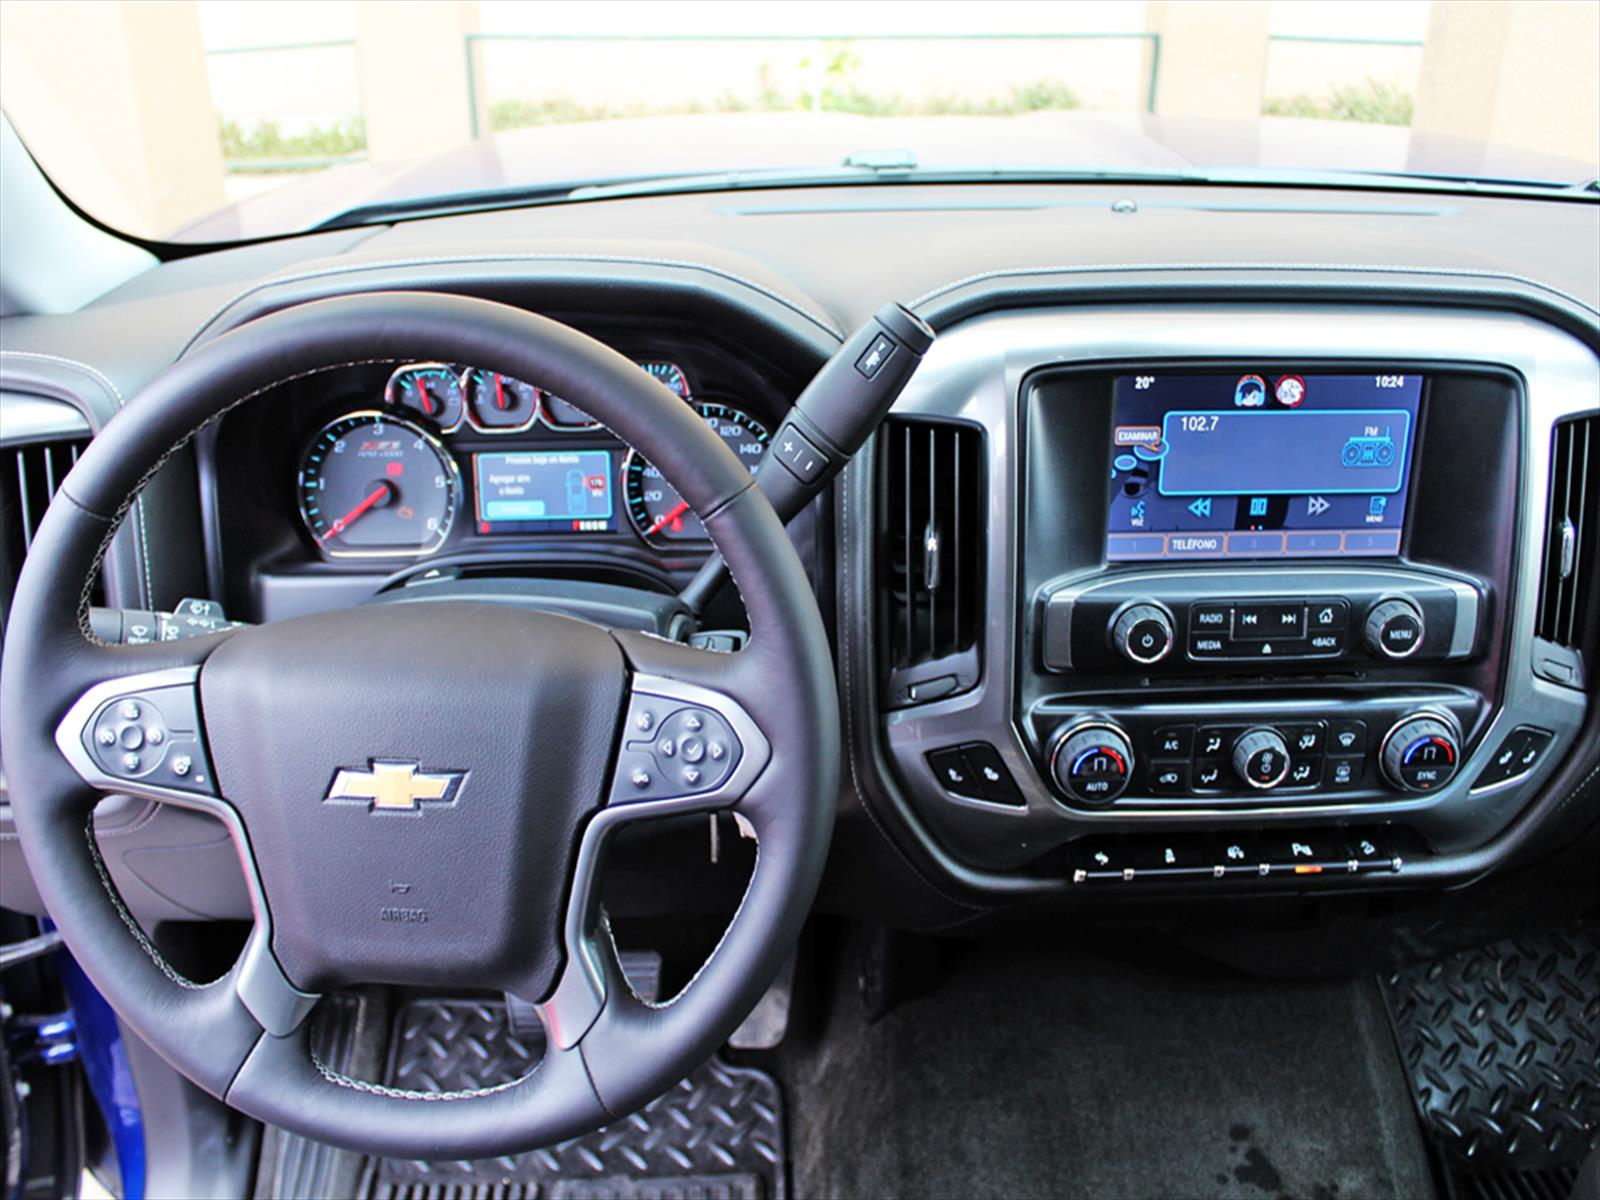 2015 Chevrolet Silverado 1500 Z71 LTZ Crew Cab   MSN